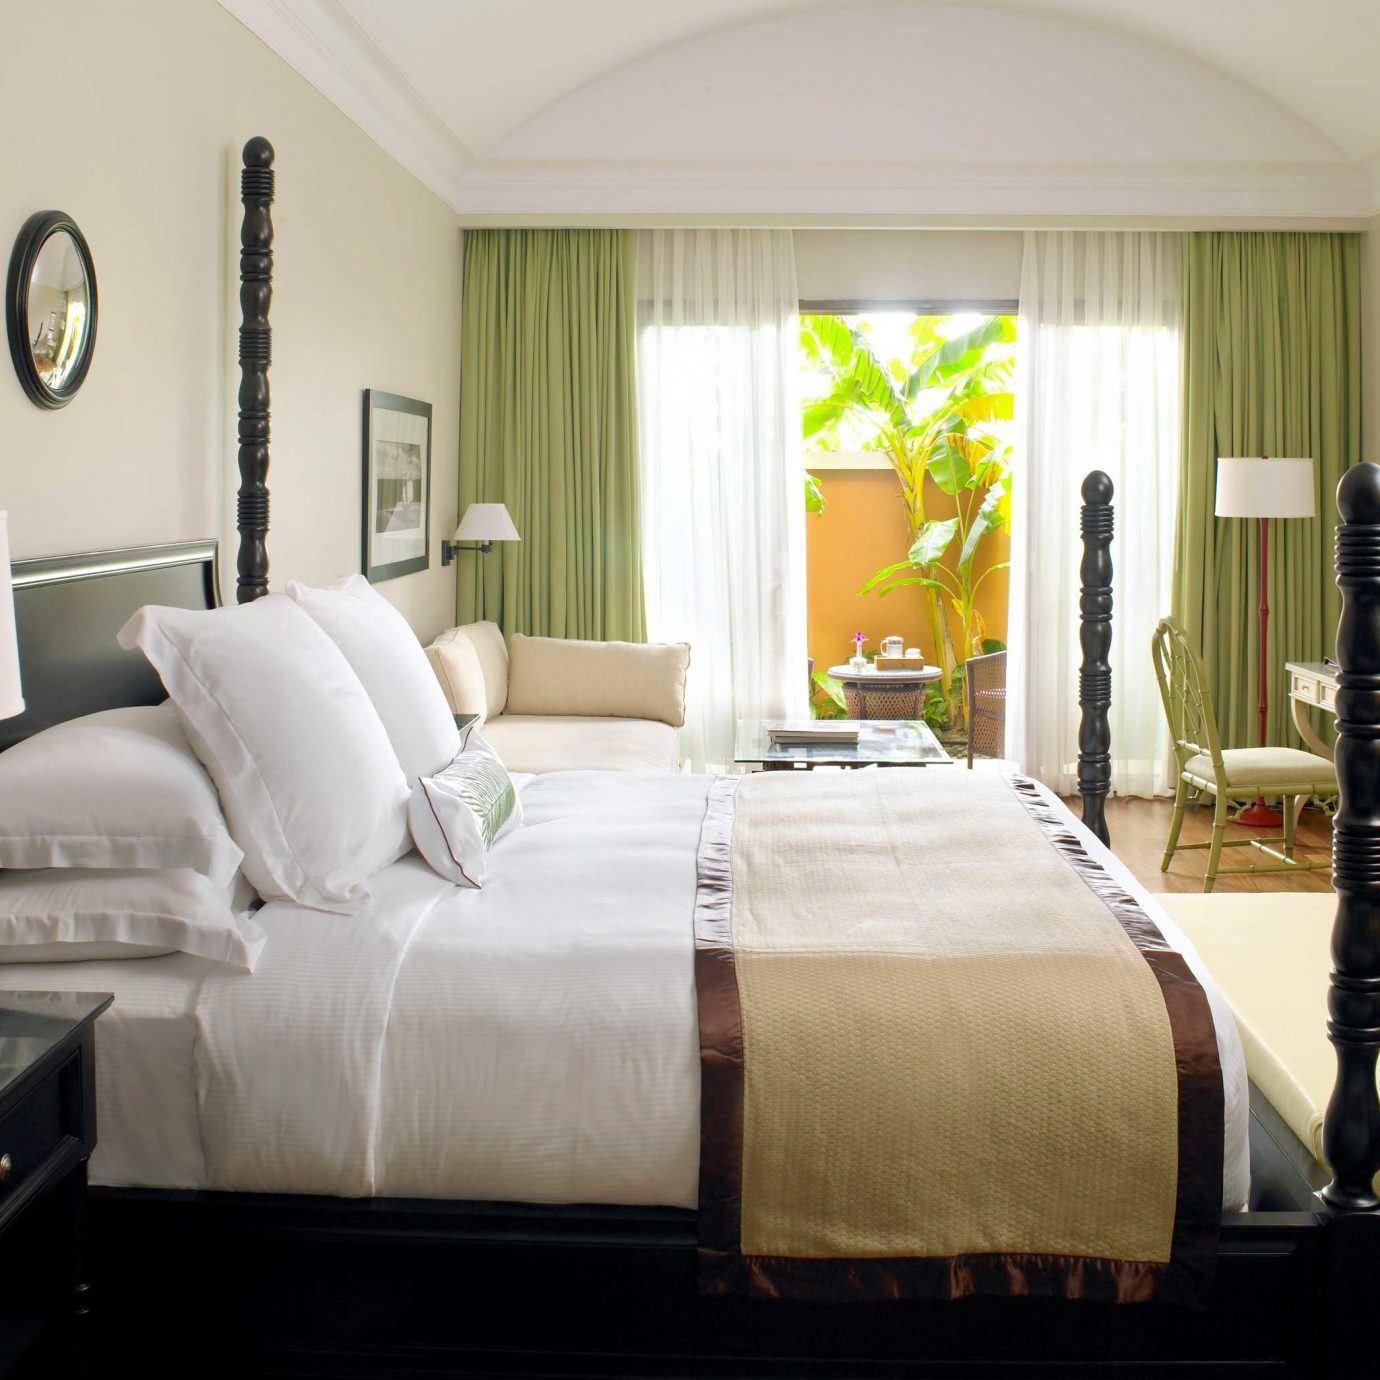 Bedroom Honeymoon Luxury Resort sofa property living room home Suite cottage bed sheet bed frame